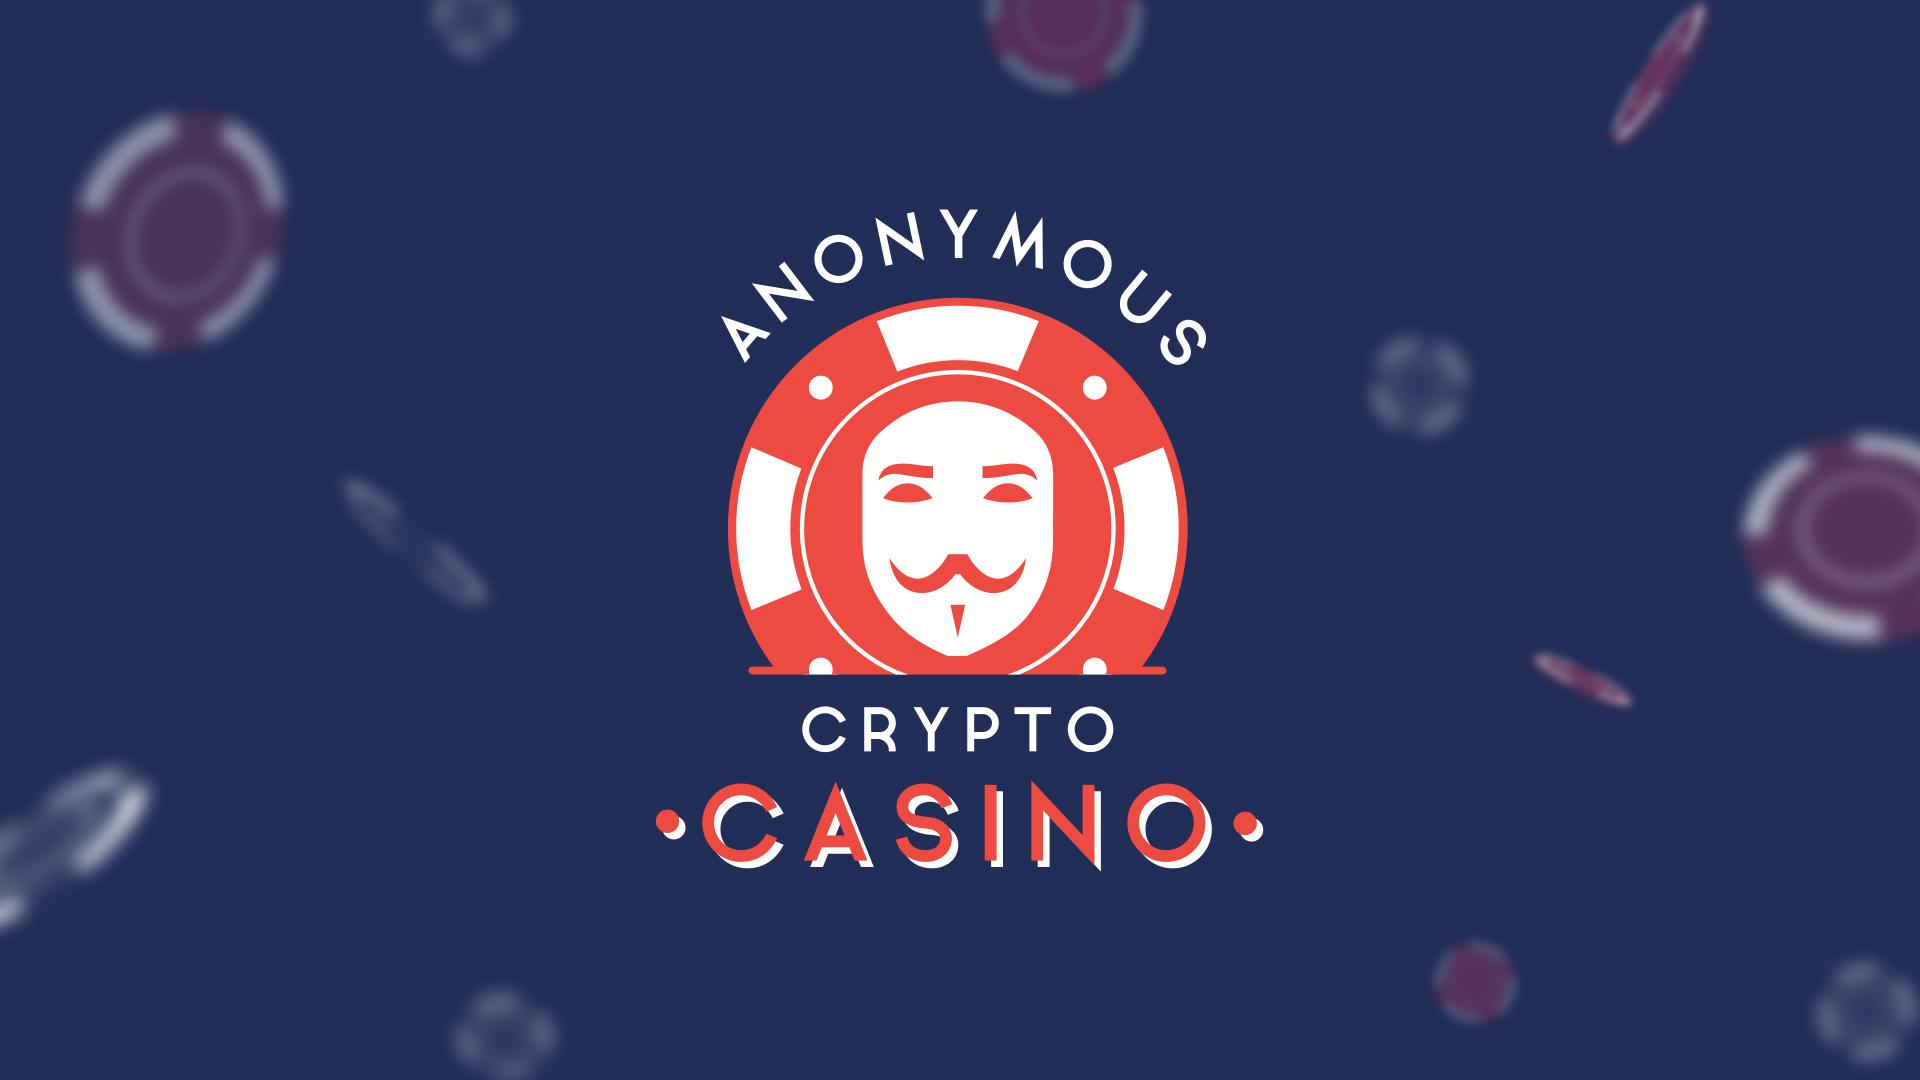 Grand bay casino no deposit bonus free spins